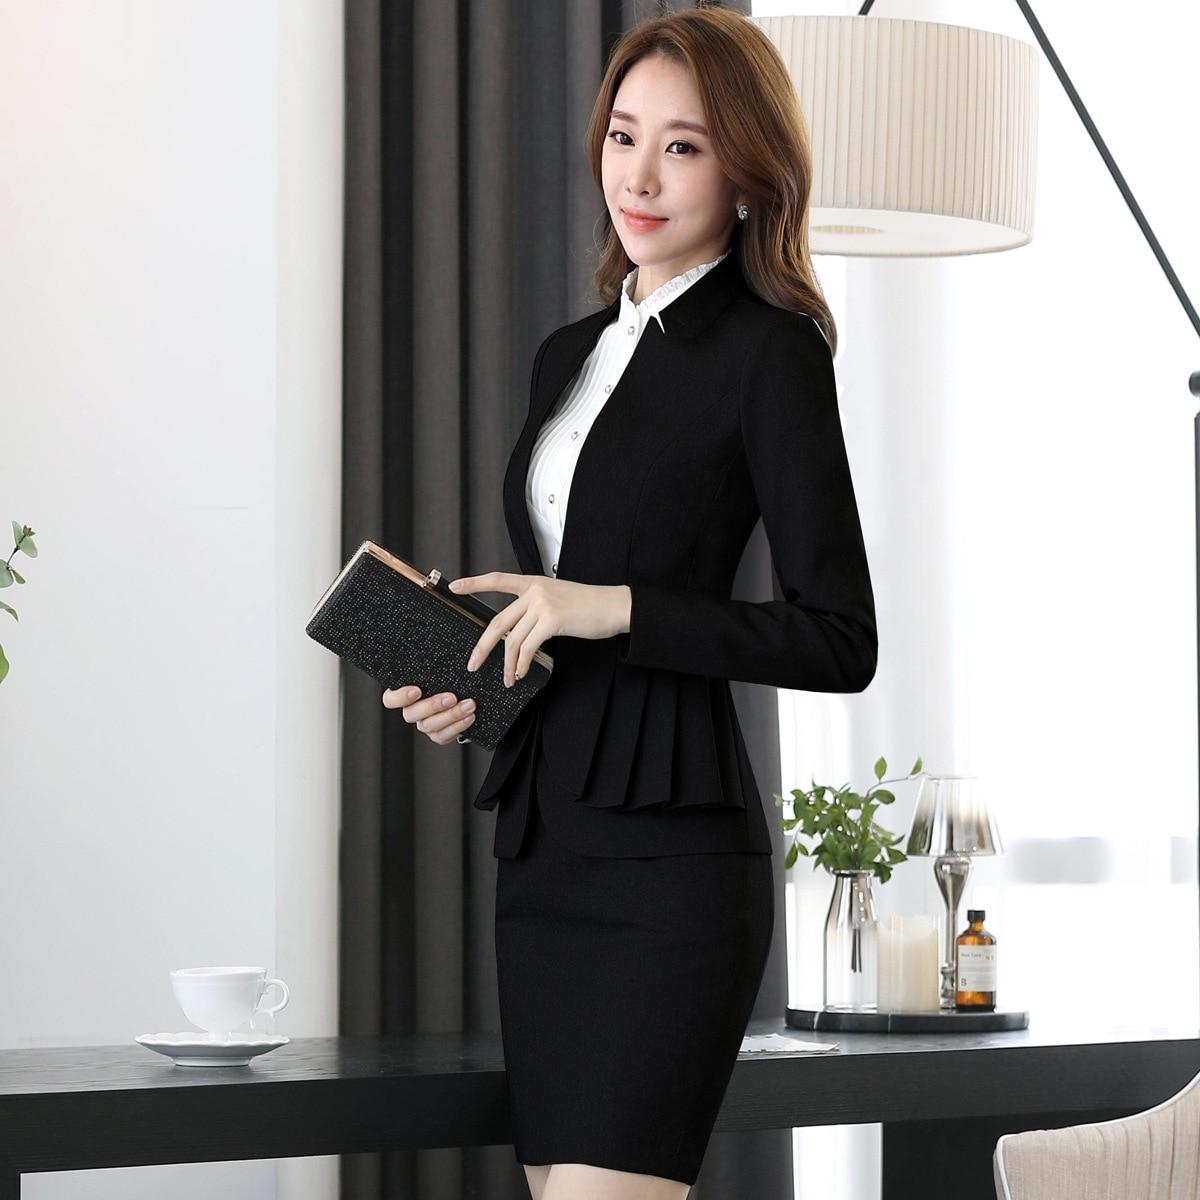 Professional Women Skirt Suits Blazers Autumn Business Ladies Office Work Wear White collar (jacket/Skirt /shirt / pants) - 5